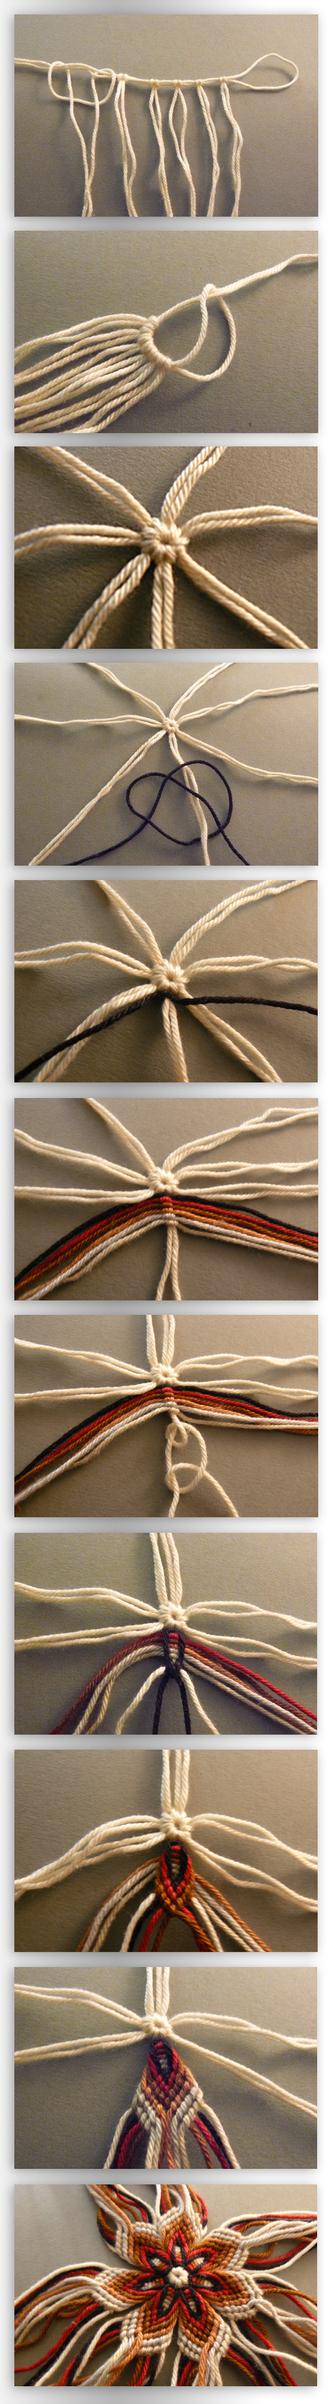 Pouch Tutorial Part I (Bottom) by nimuae